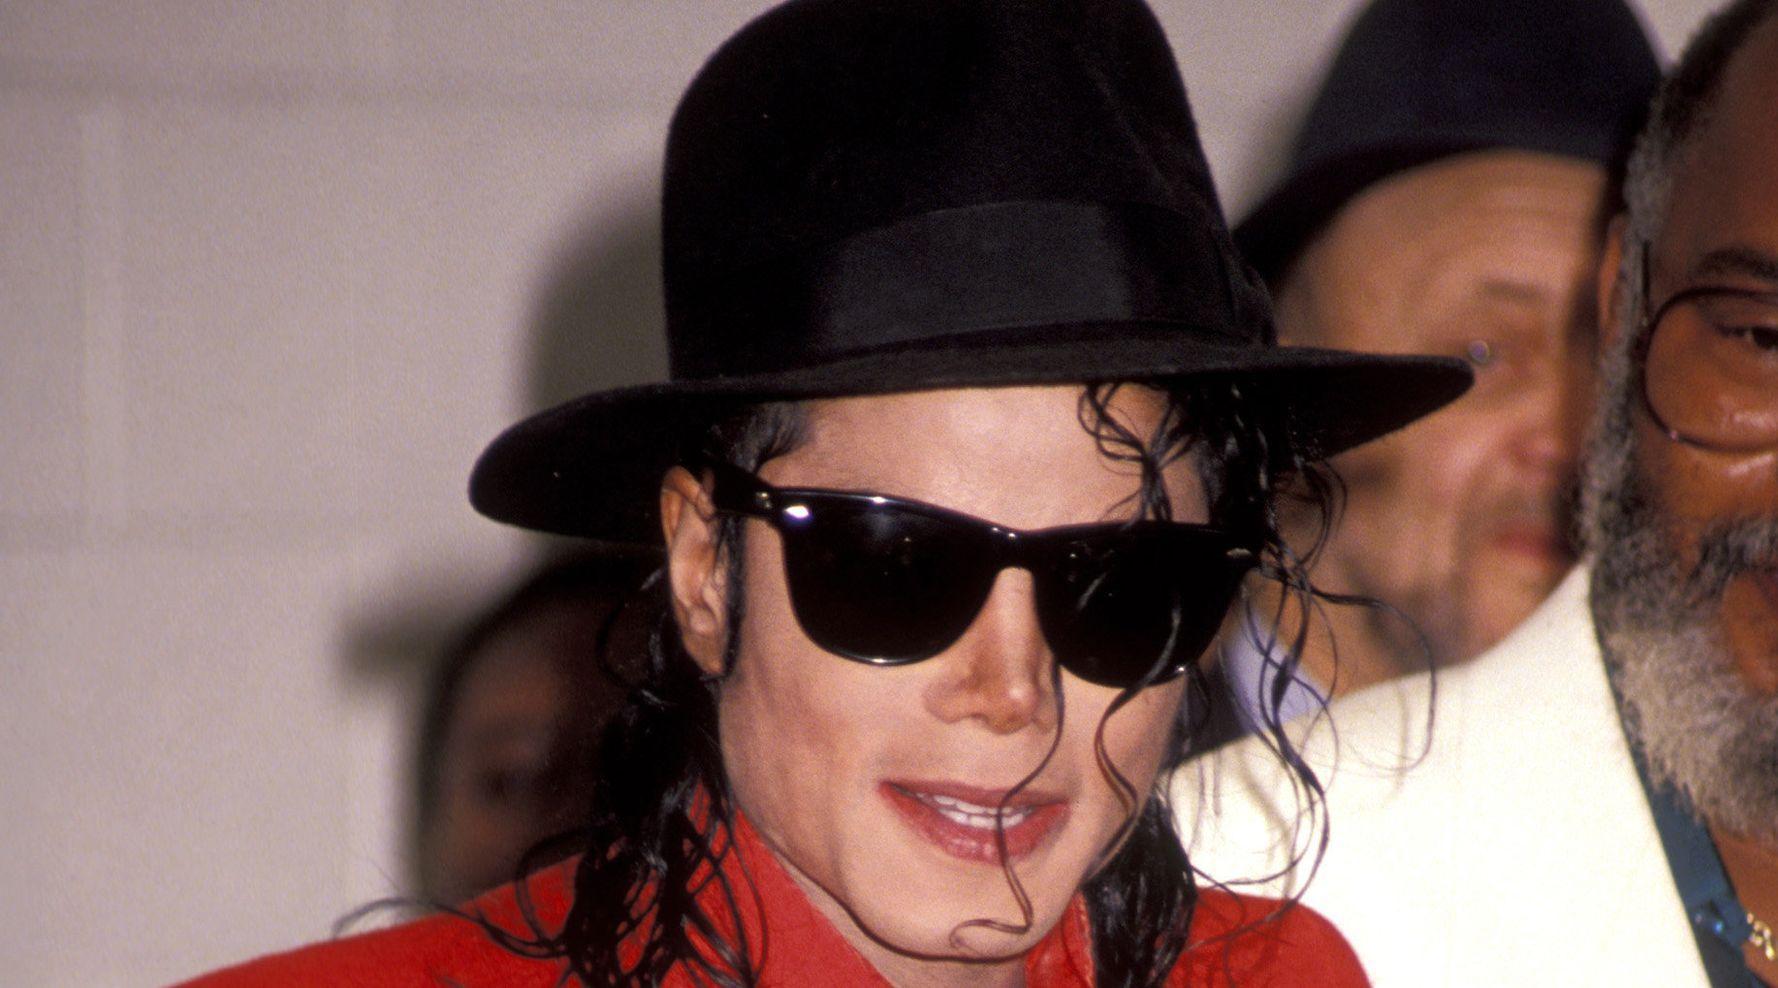 Westlake Legal Group 5c8ea2fd2300008900e867a1 Marlon Brando Confronted Michael Jackson About Child Abuse Allegations